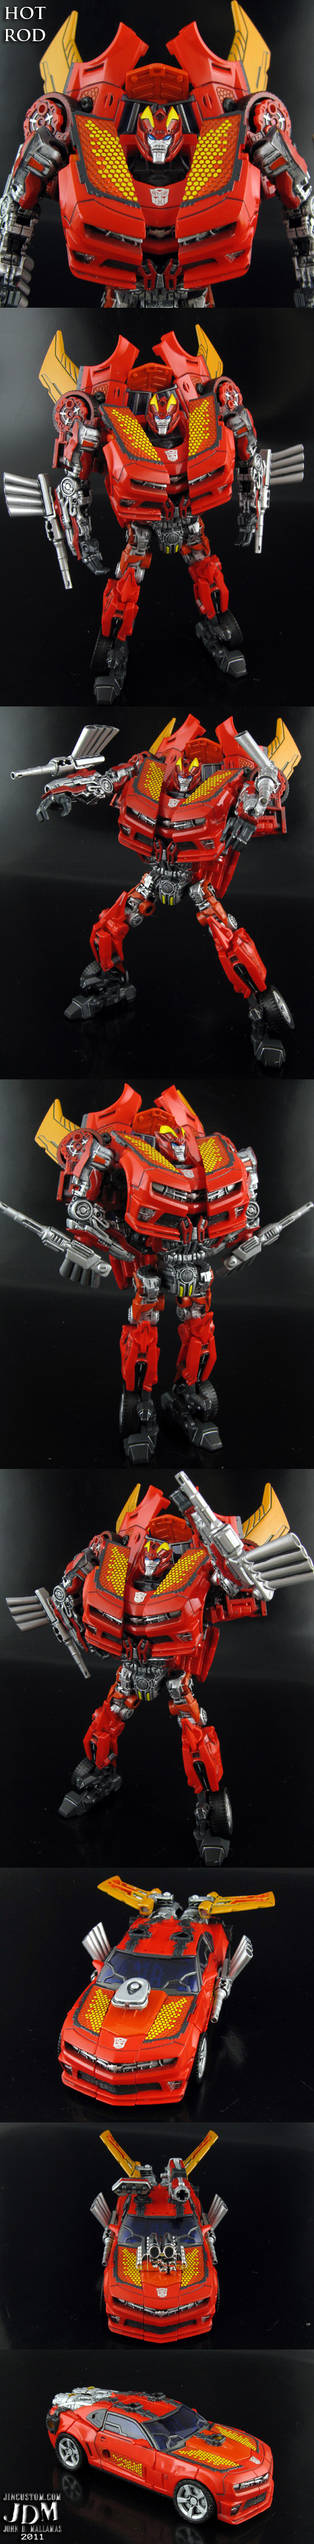 Transformers DotM Hot Rod